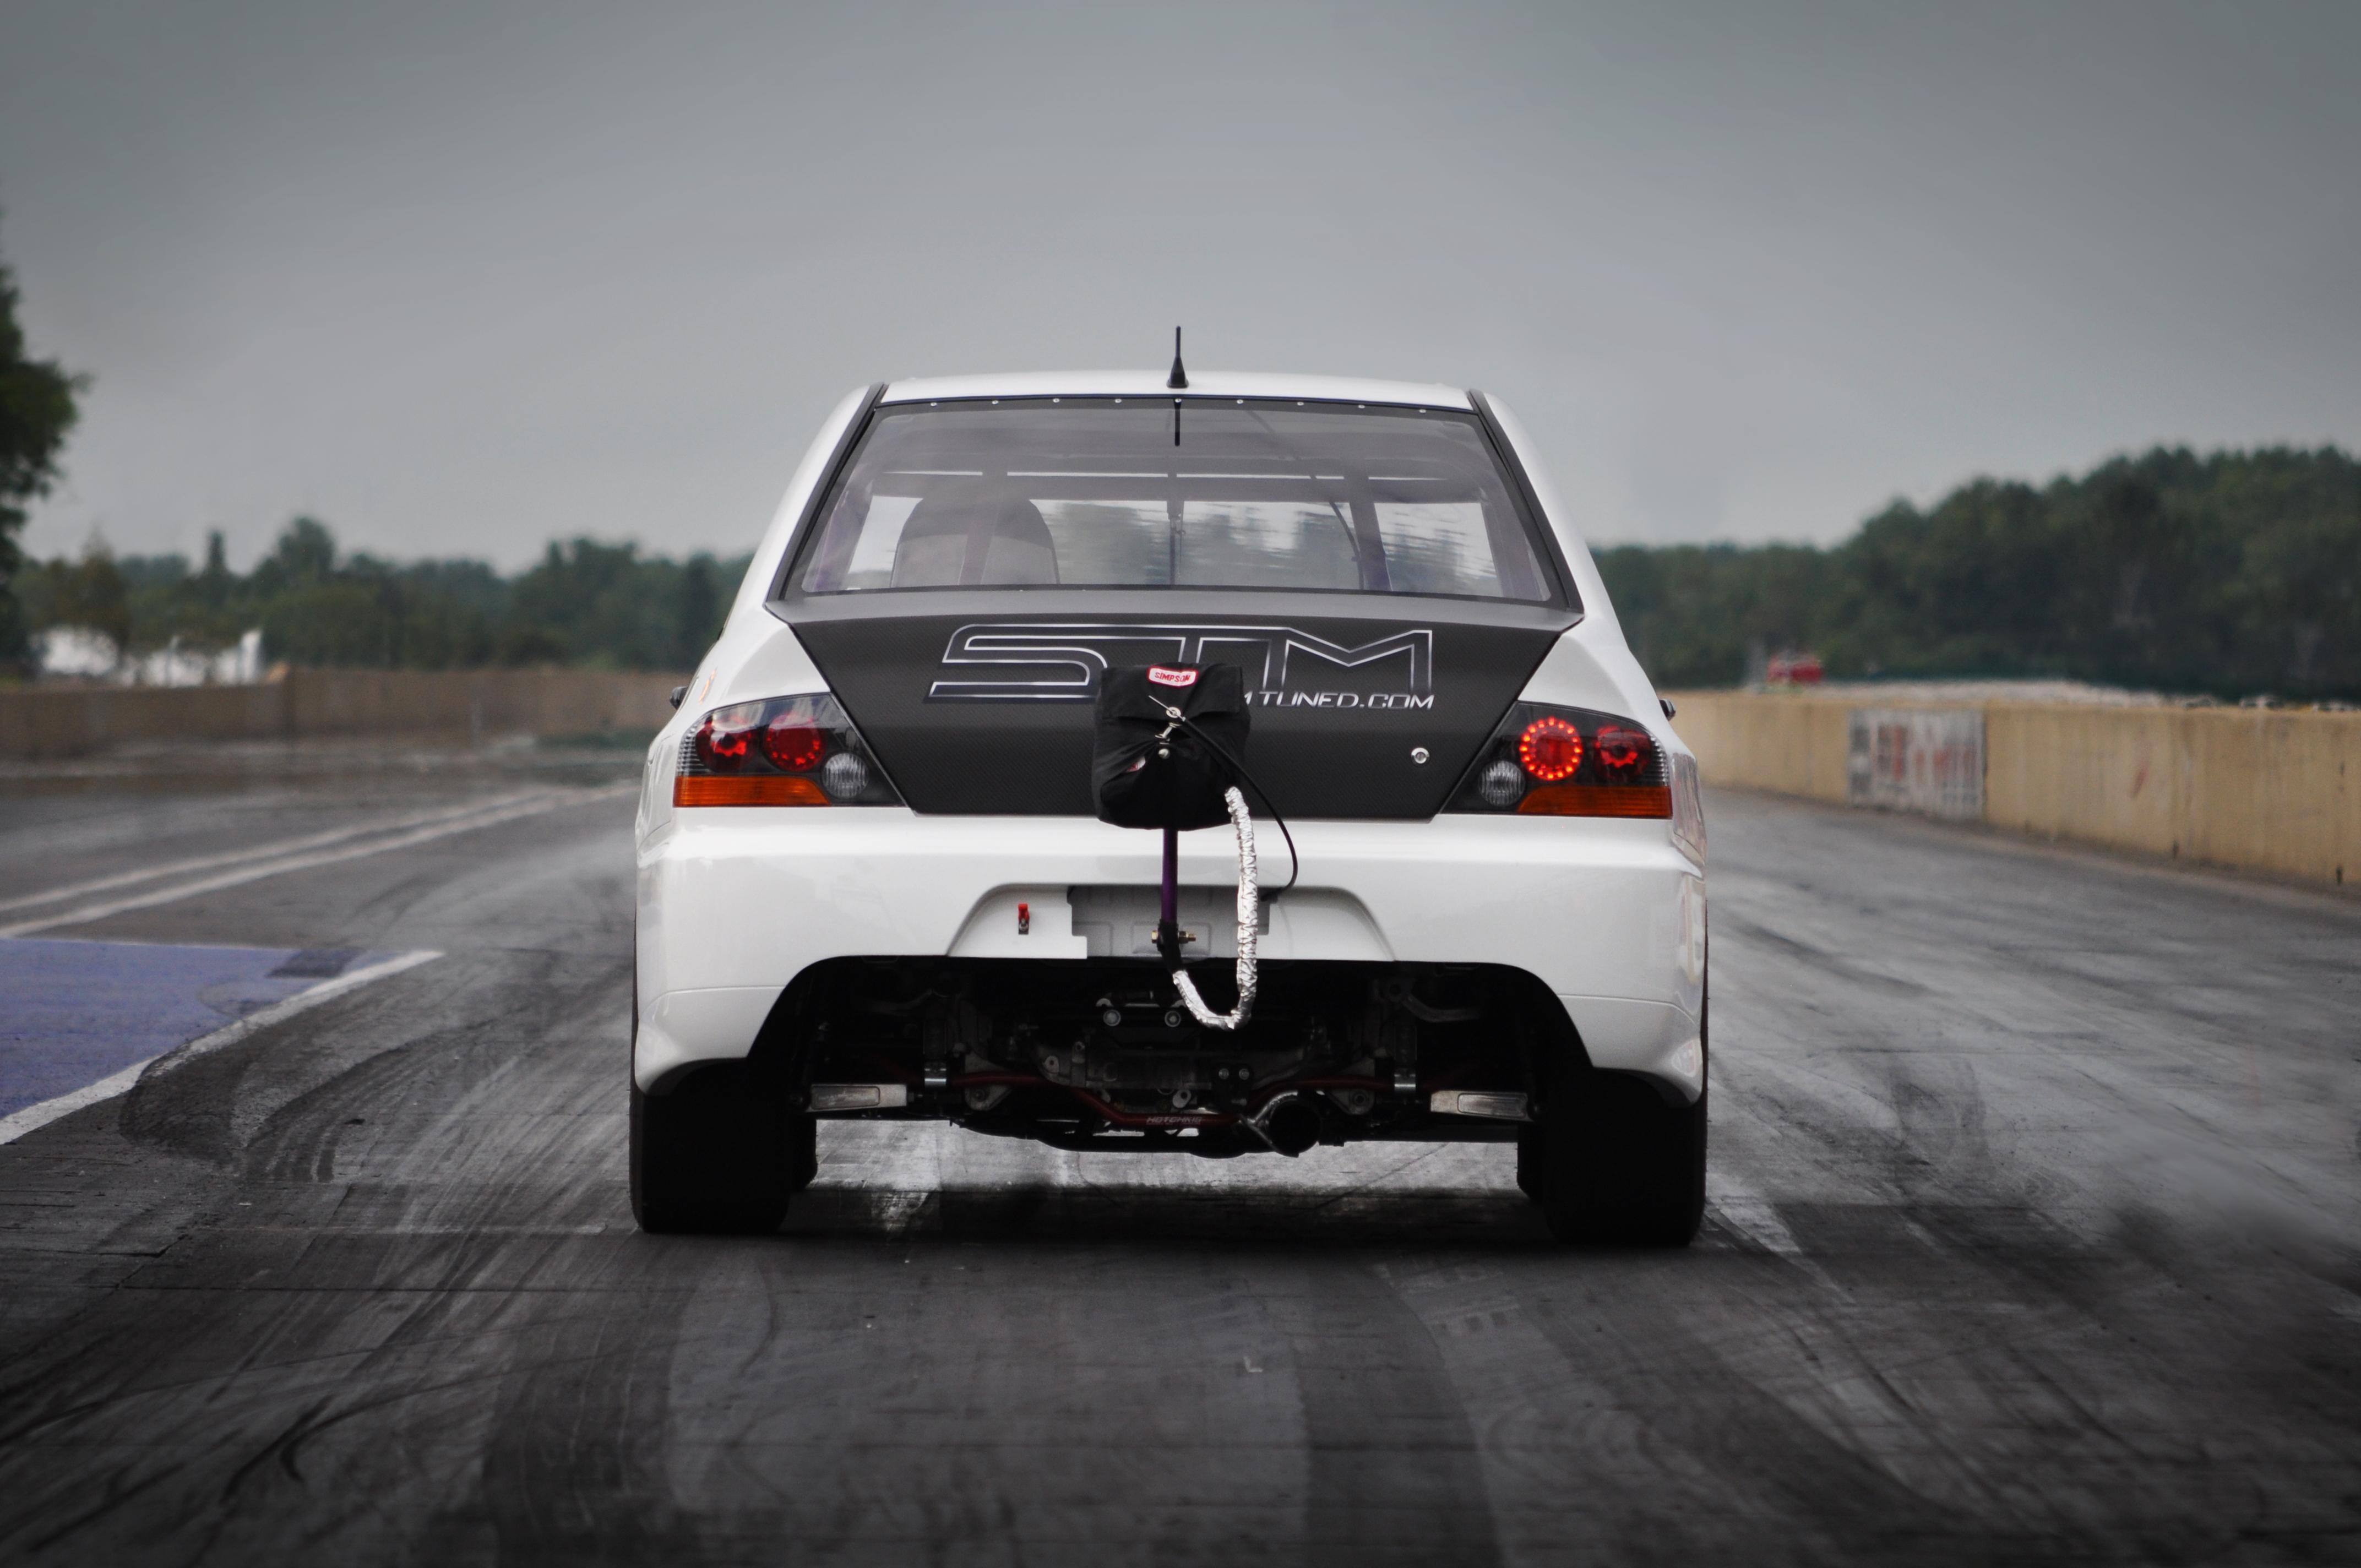 High Res Desktop Wallpaper STM White Evo RS Rear Drag Parachute